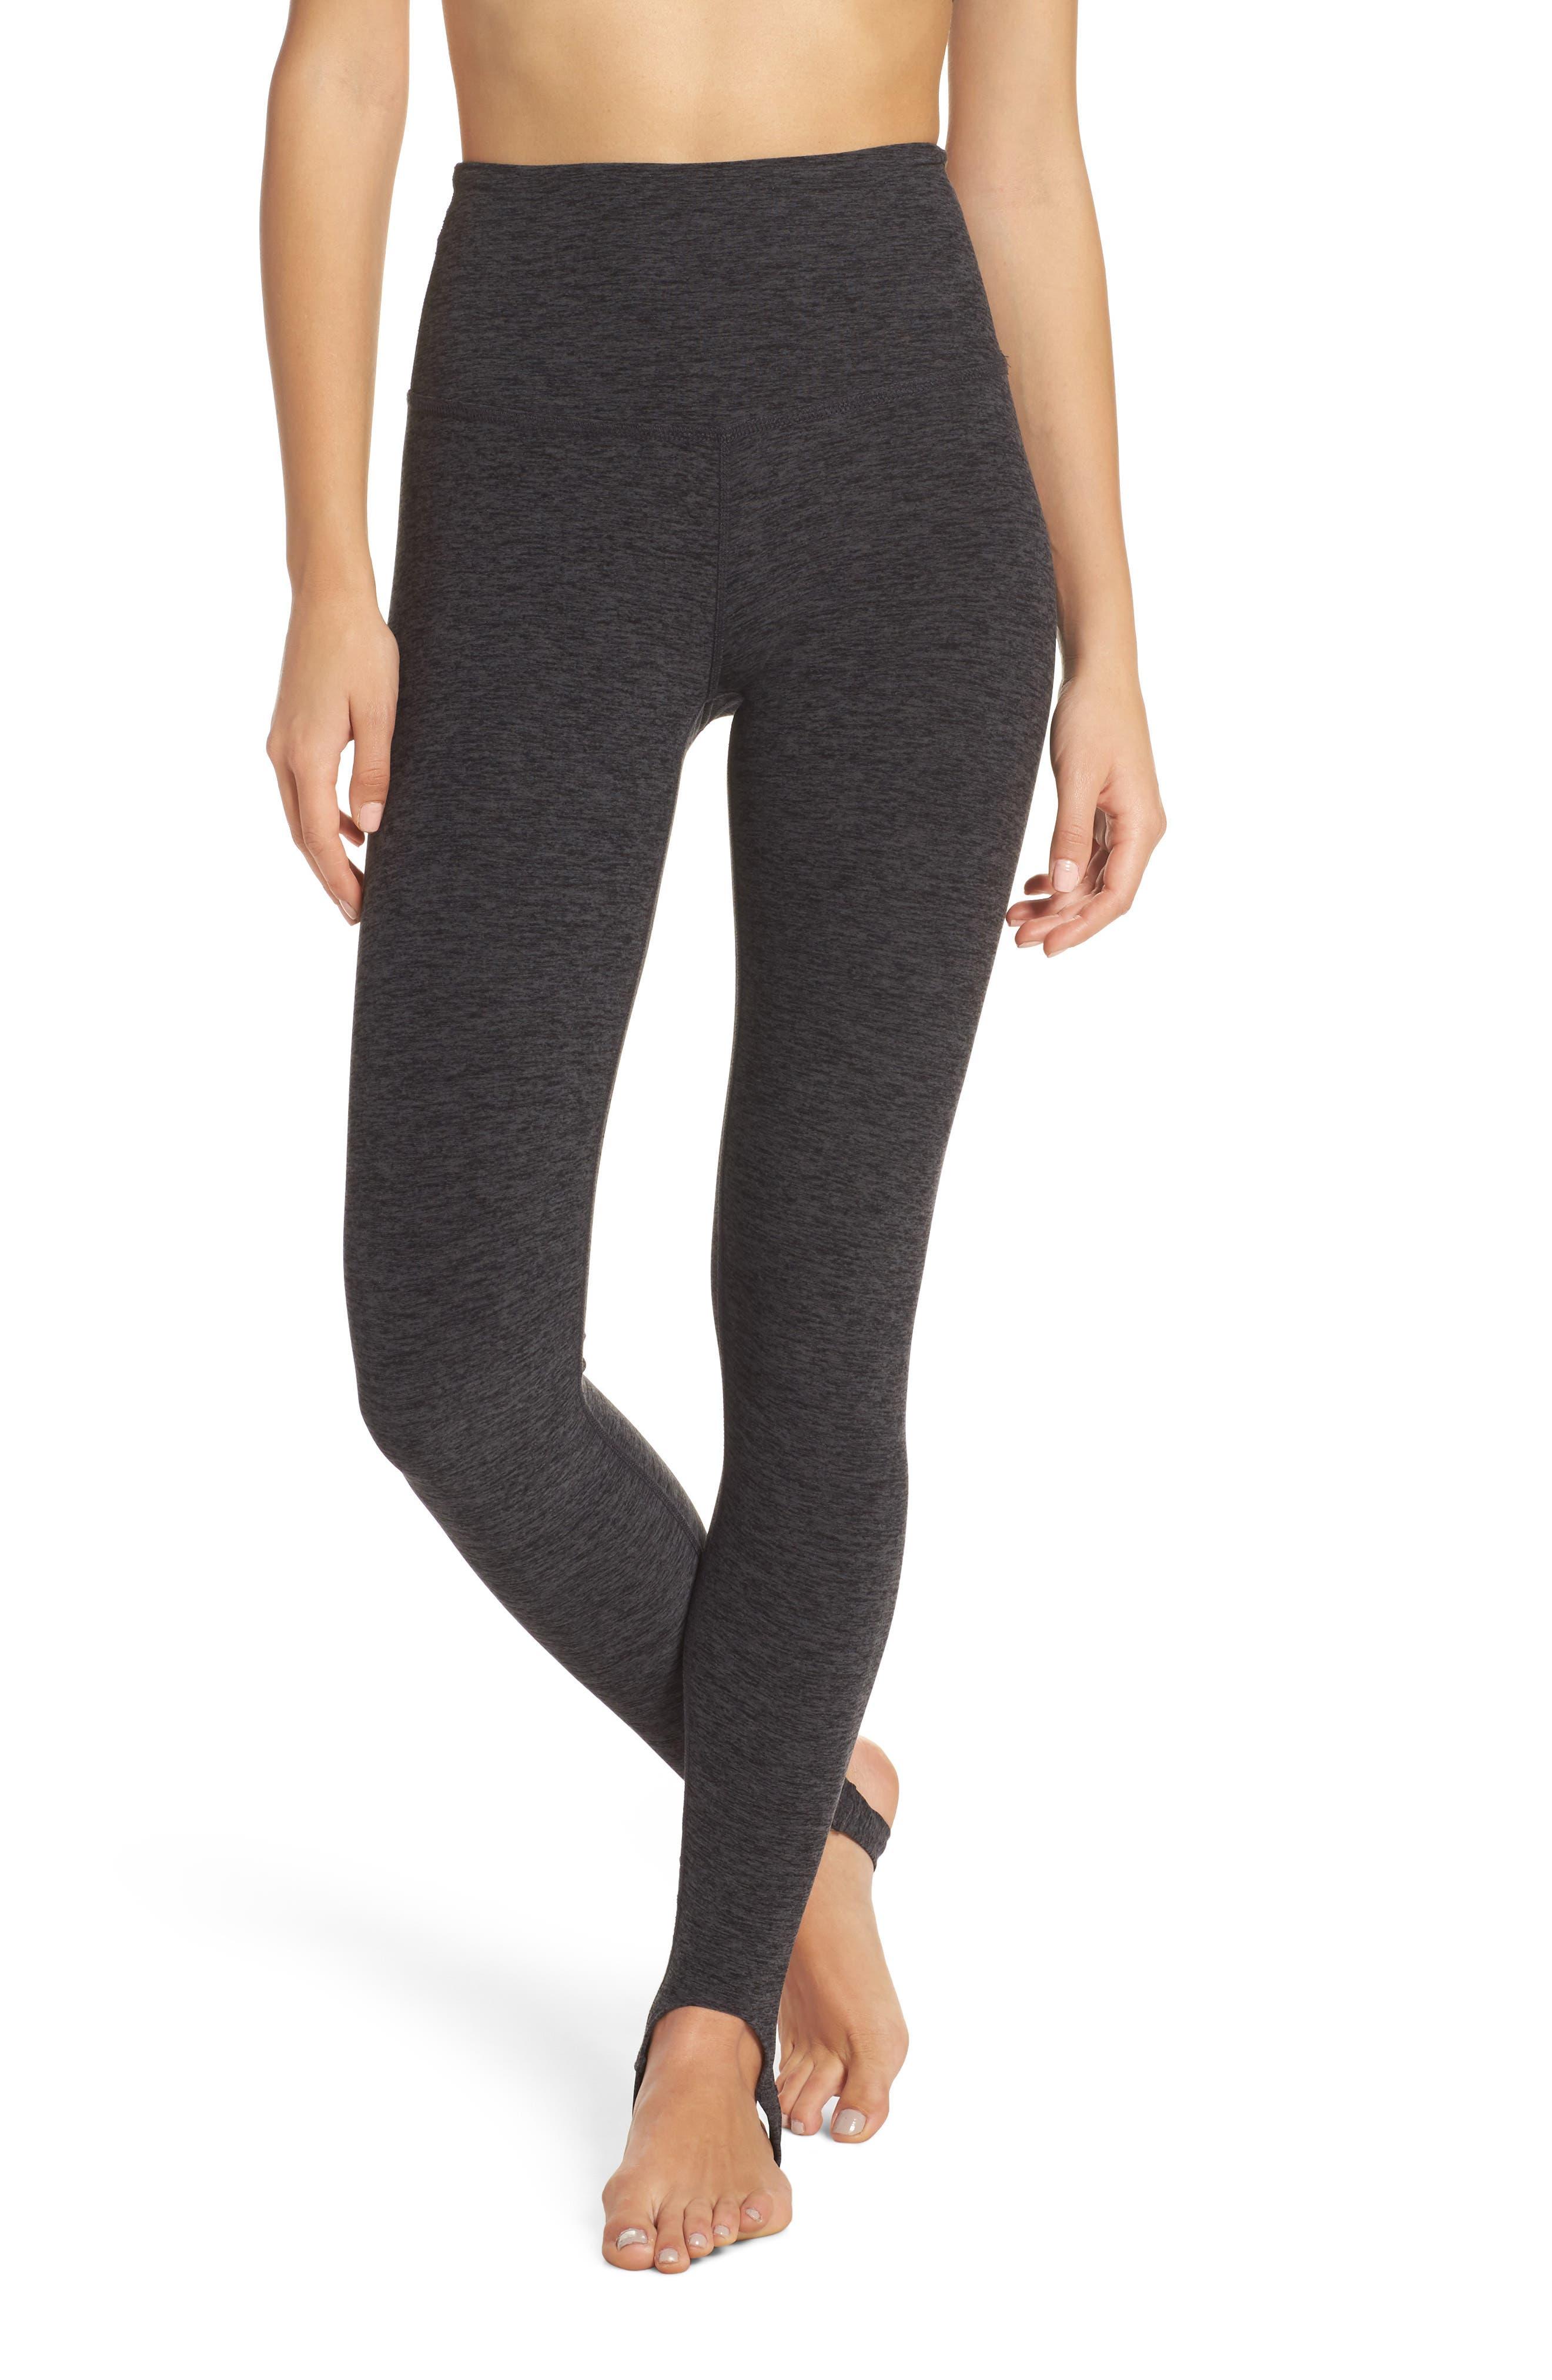 High Waist Stirrup Leggings,                         Main,                         color, Black/ Charcoal